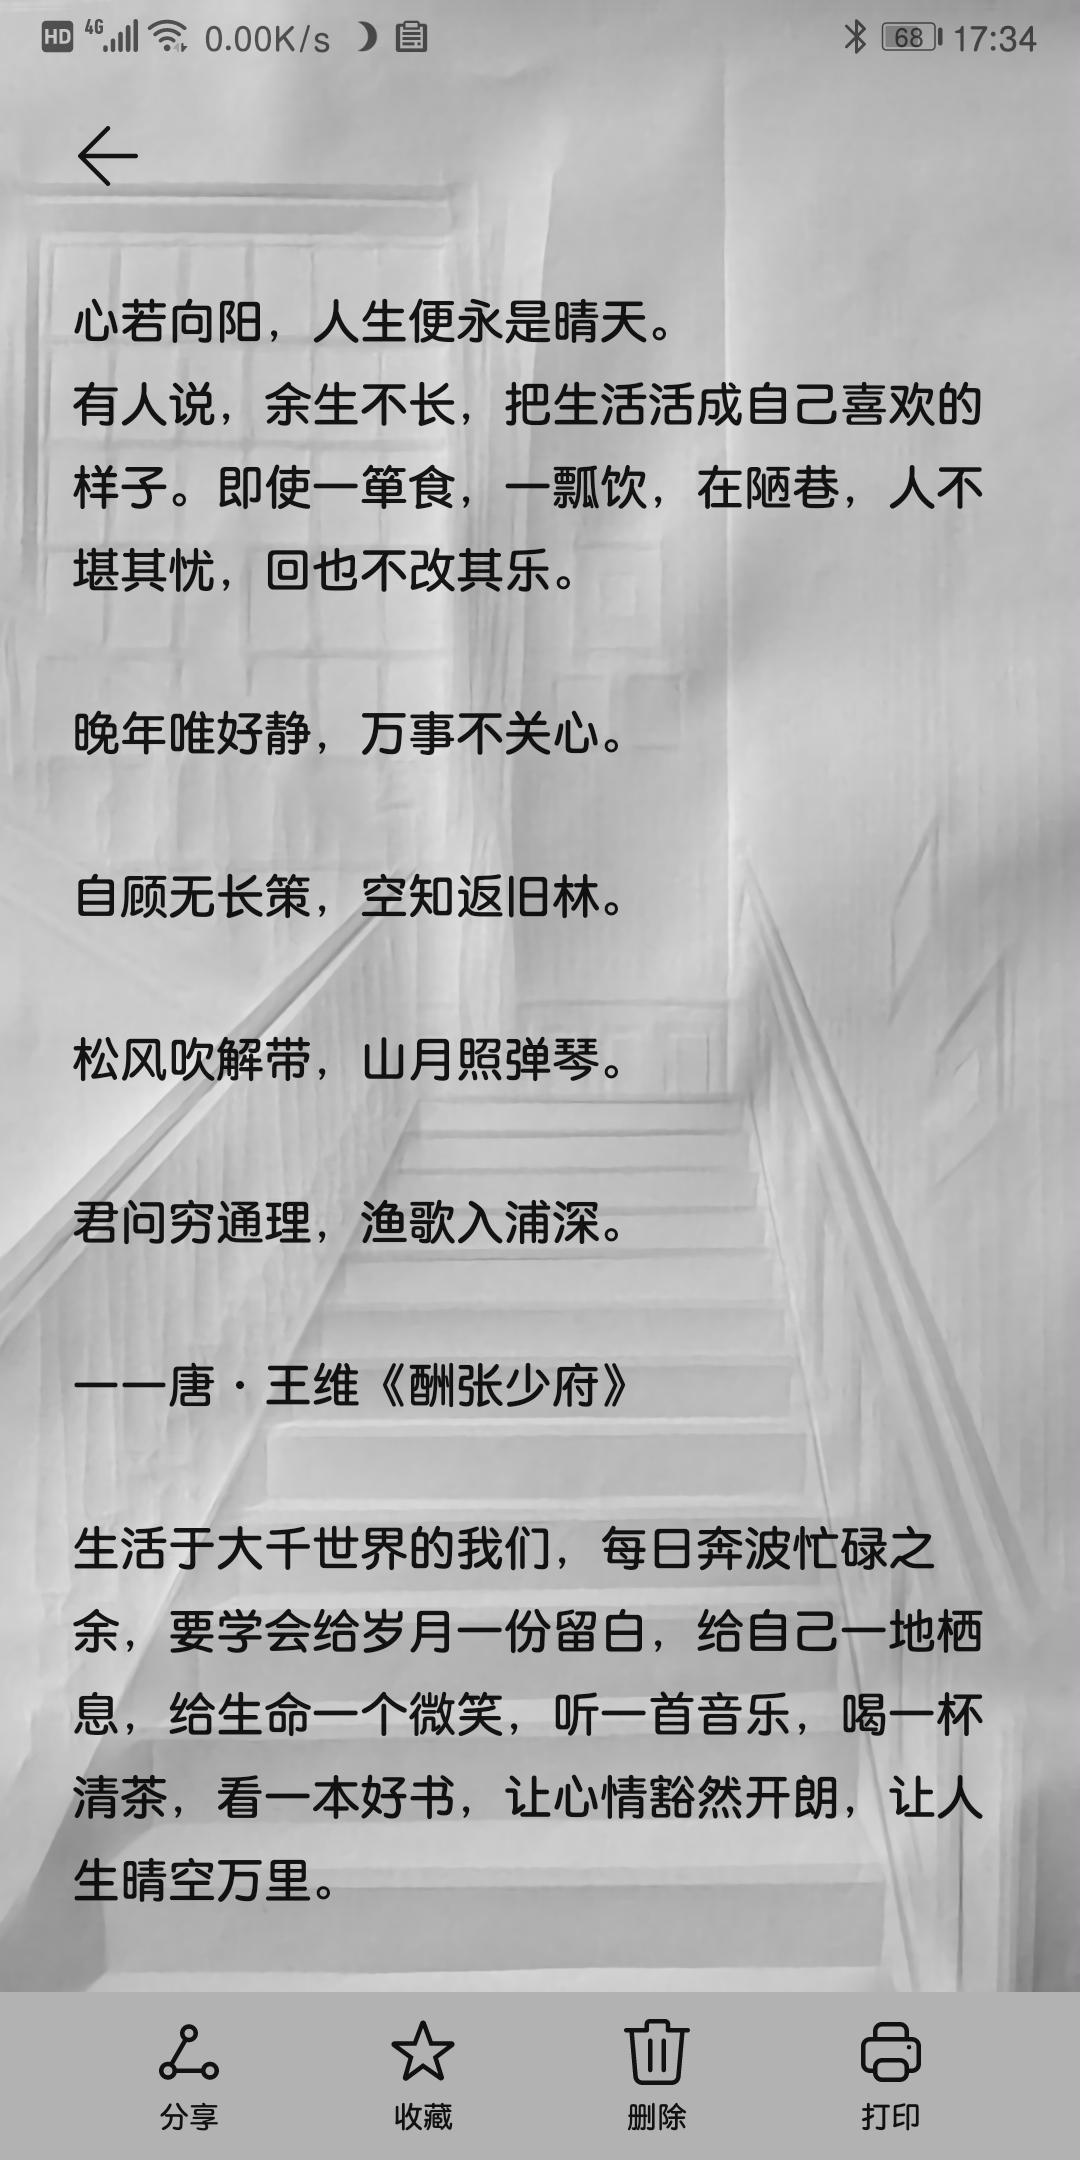 Screenshot_20200309_173414_com.example.android.notepad.jpg